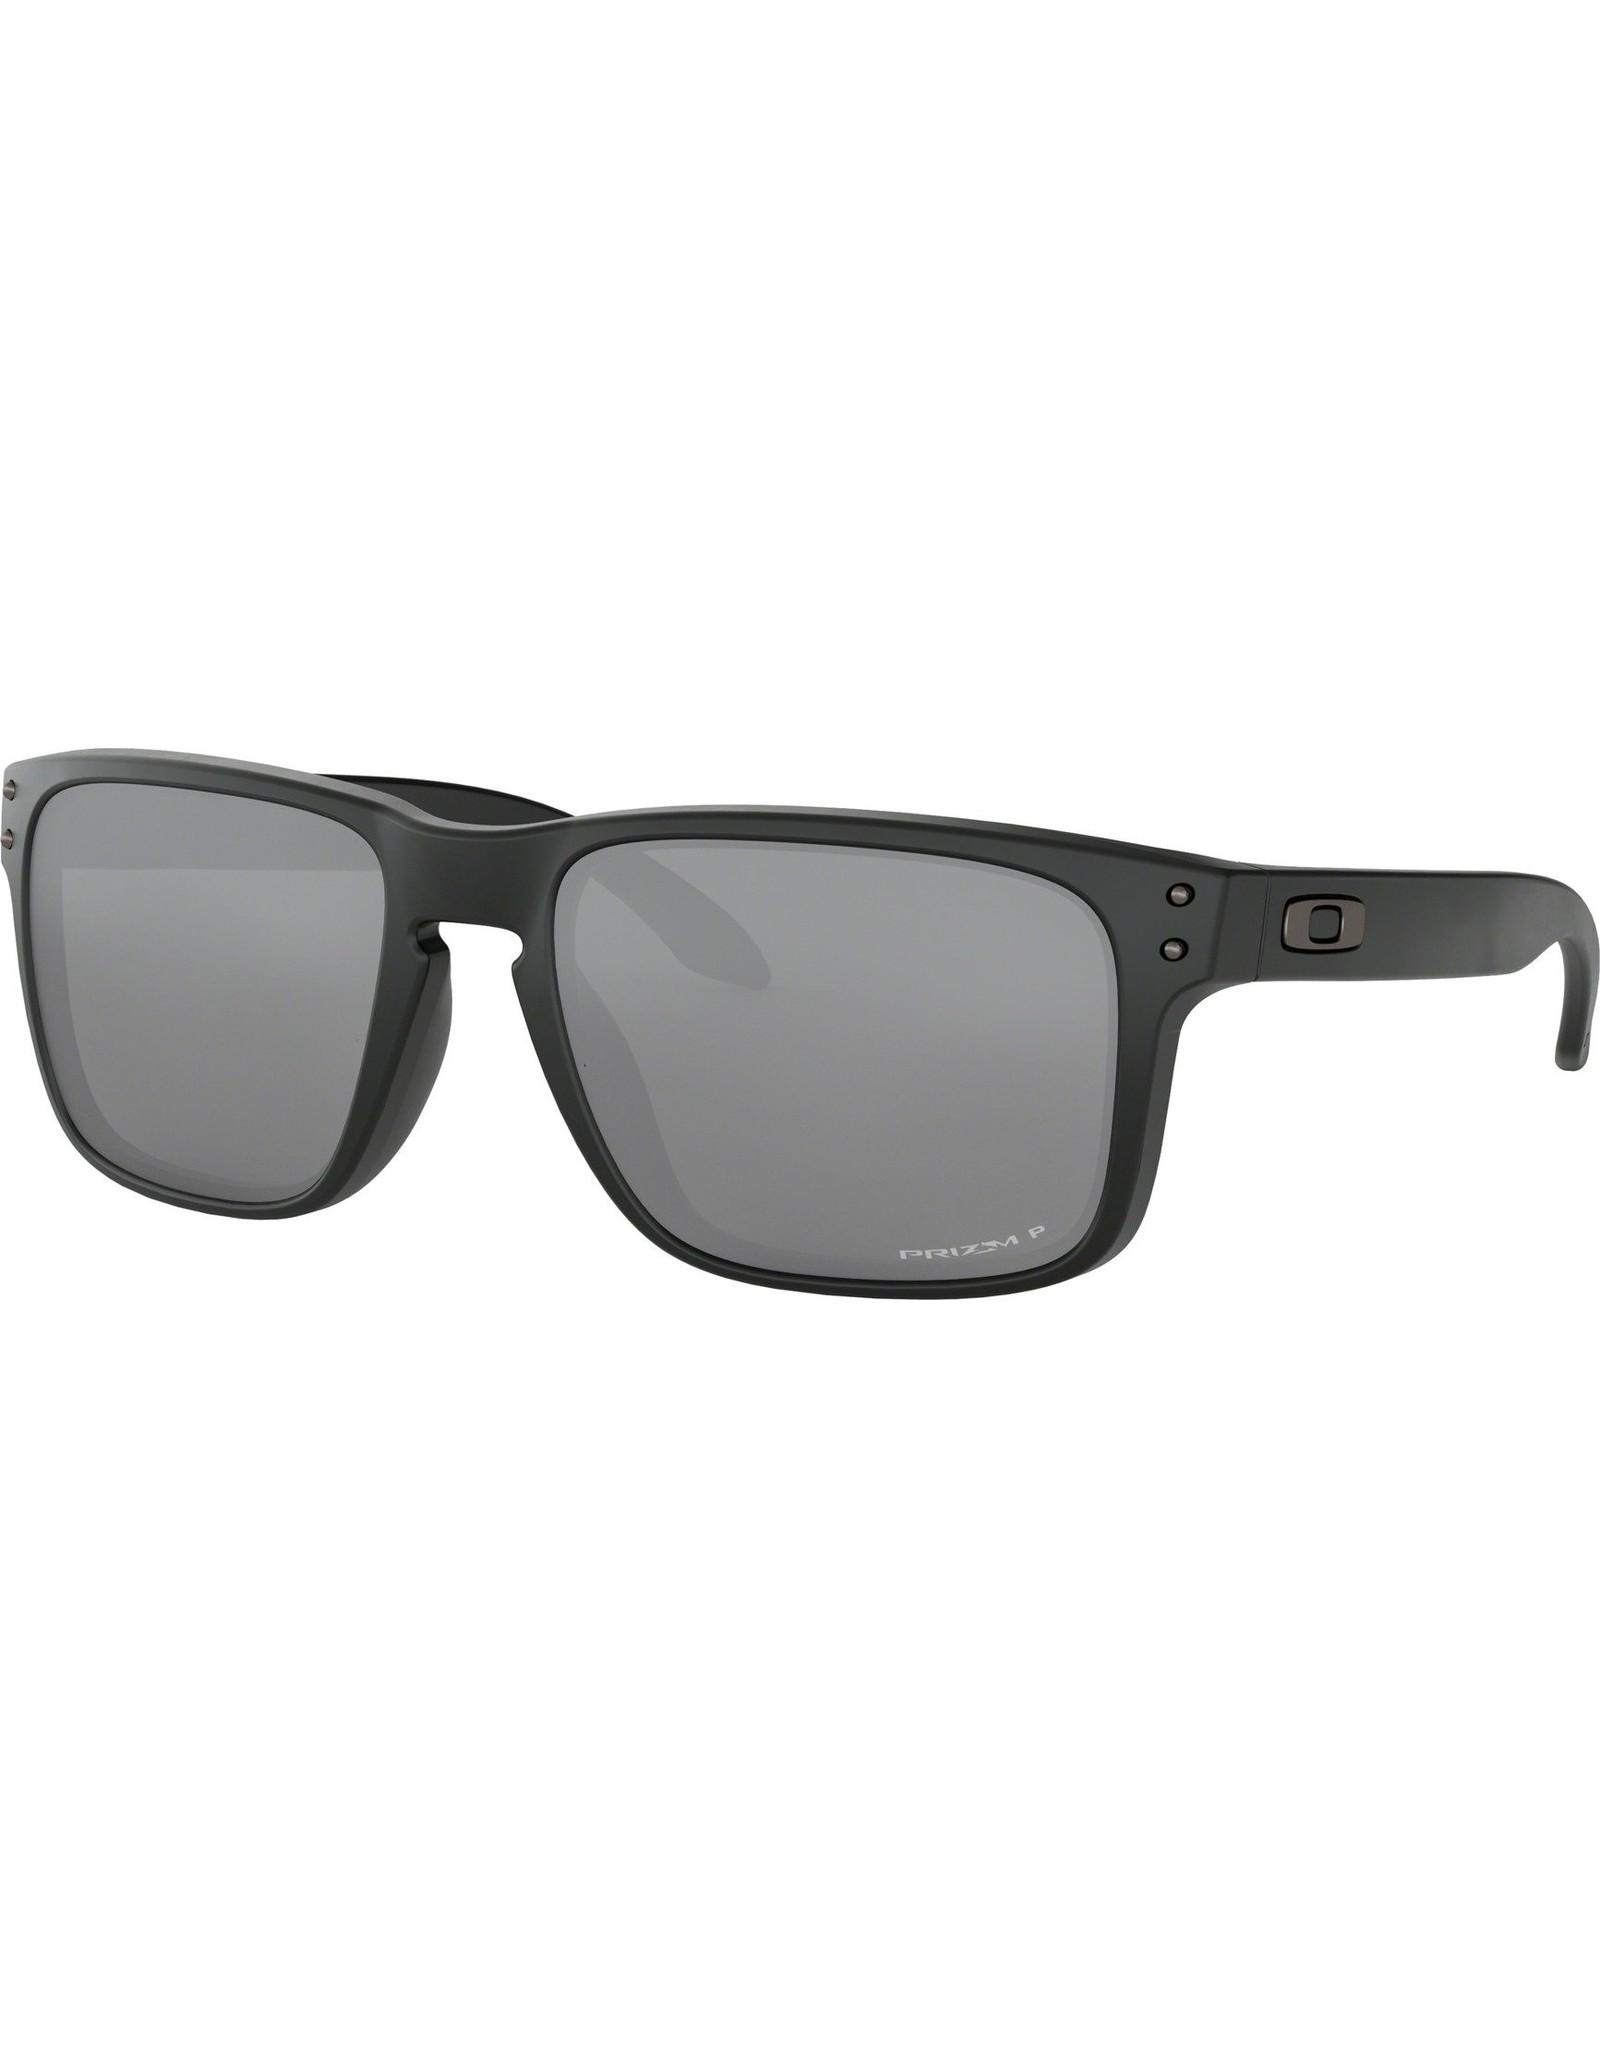 Oakley Mens sunglasses Holbrook XL mt blk w/ prizm black pol